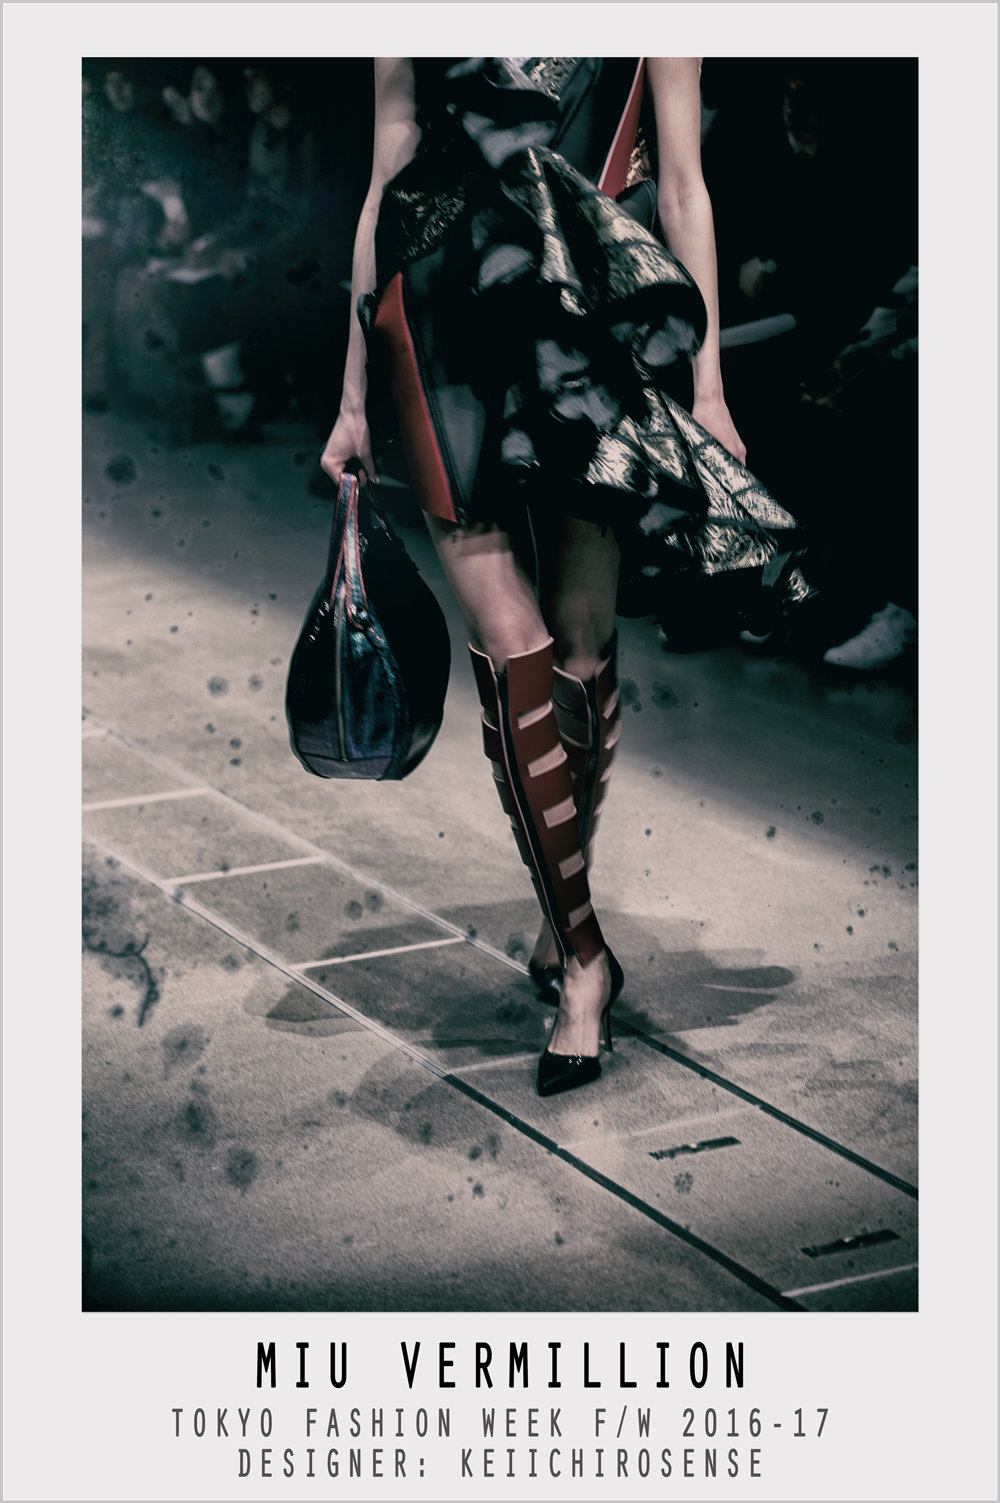 Miu Vermillion - Experimental Photography - Tokyo Fashion Week FW 2016-17 - Keiichirosense